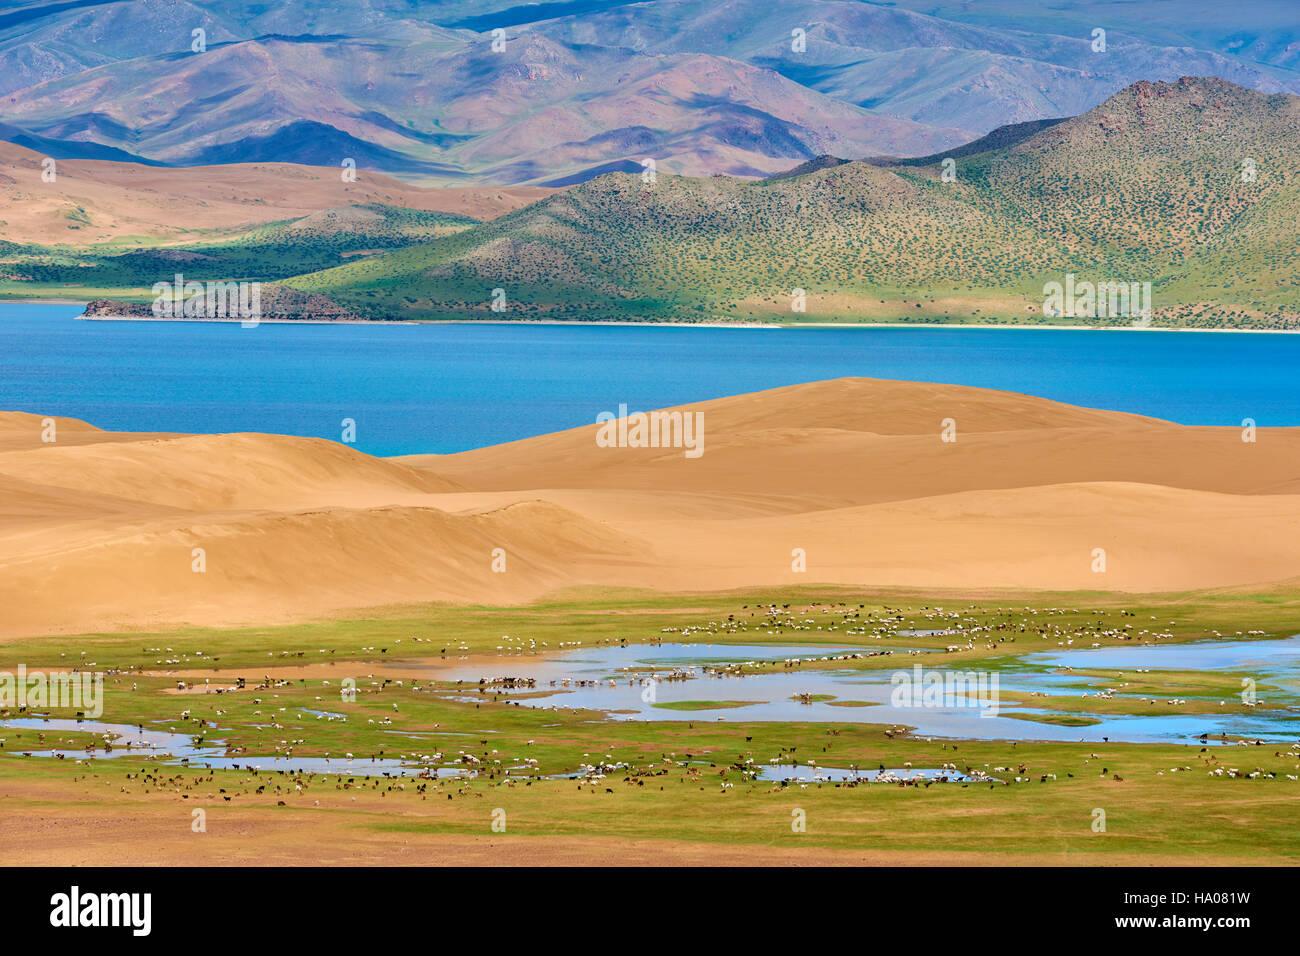 Mongolia, Zavkhan province, Khar Nuur lake, sand dune around Khar Nuur Lake - Stock Image